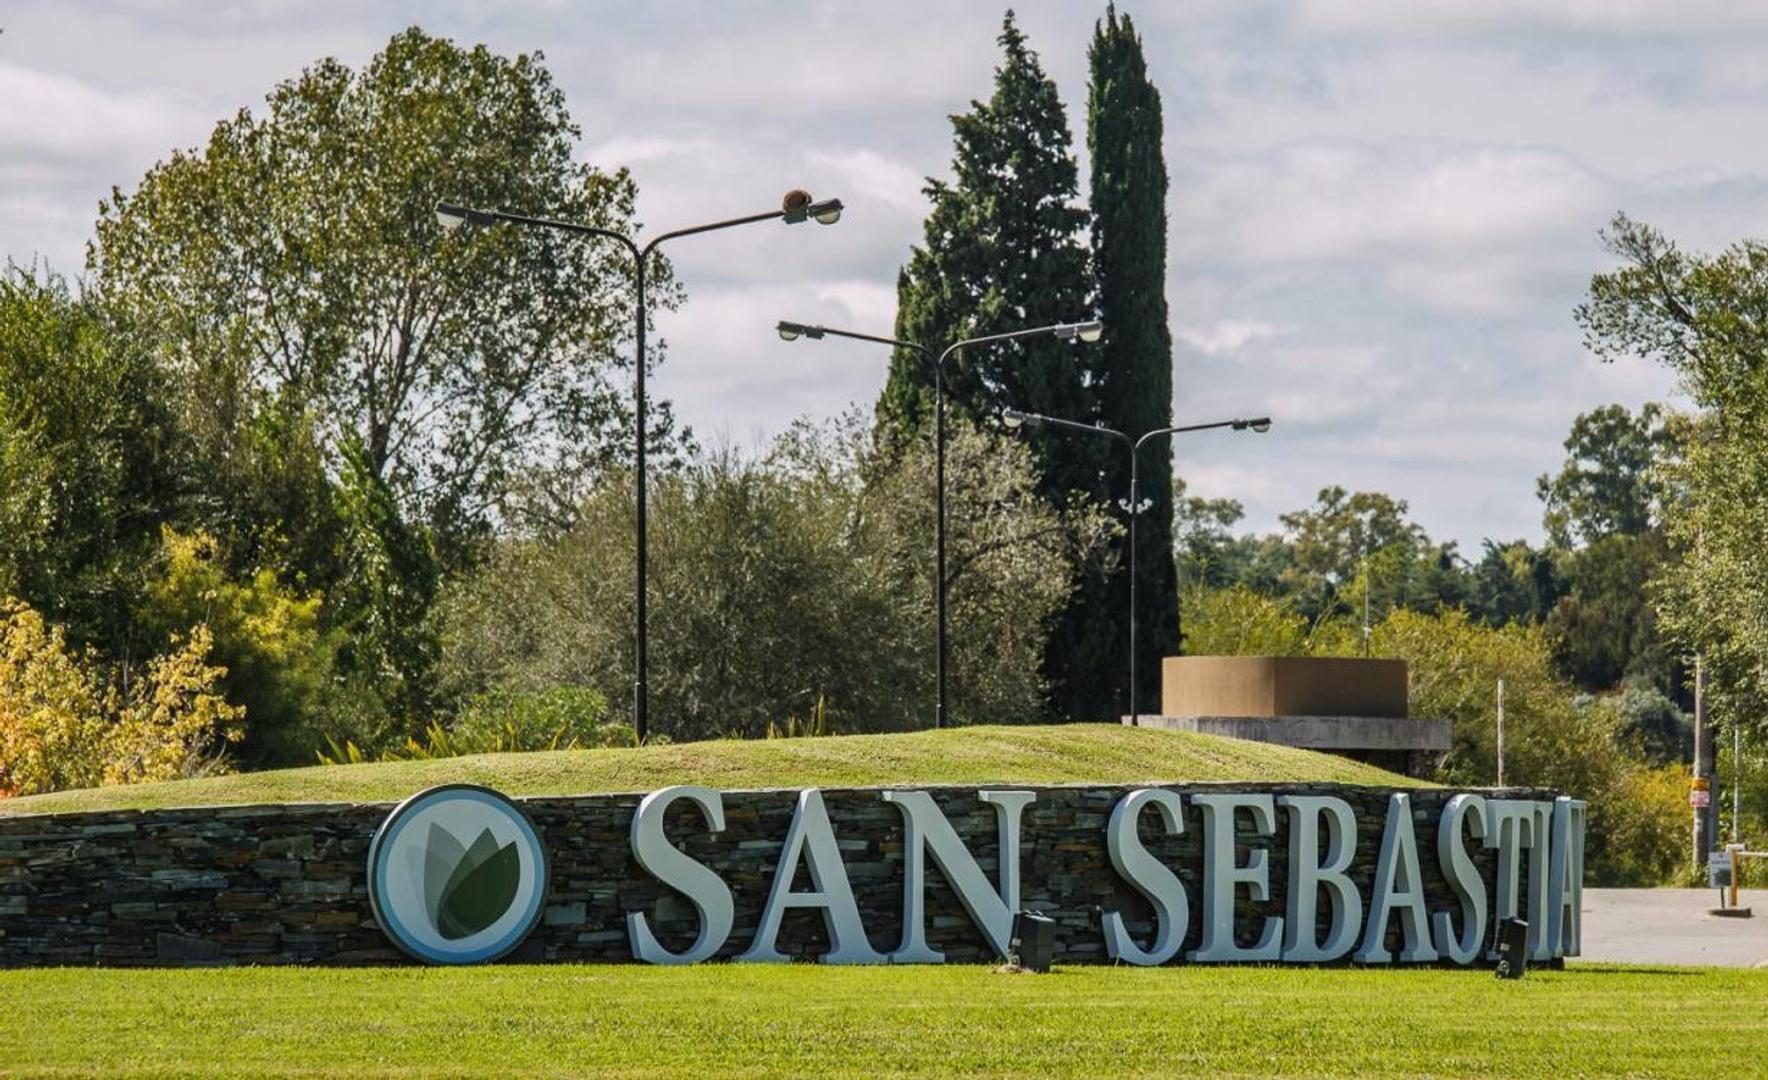 Lote en venta Barrio Cerrado San Sebastian